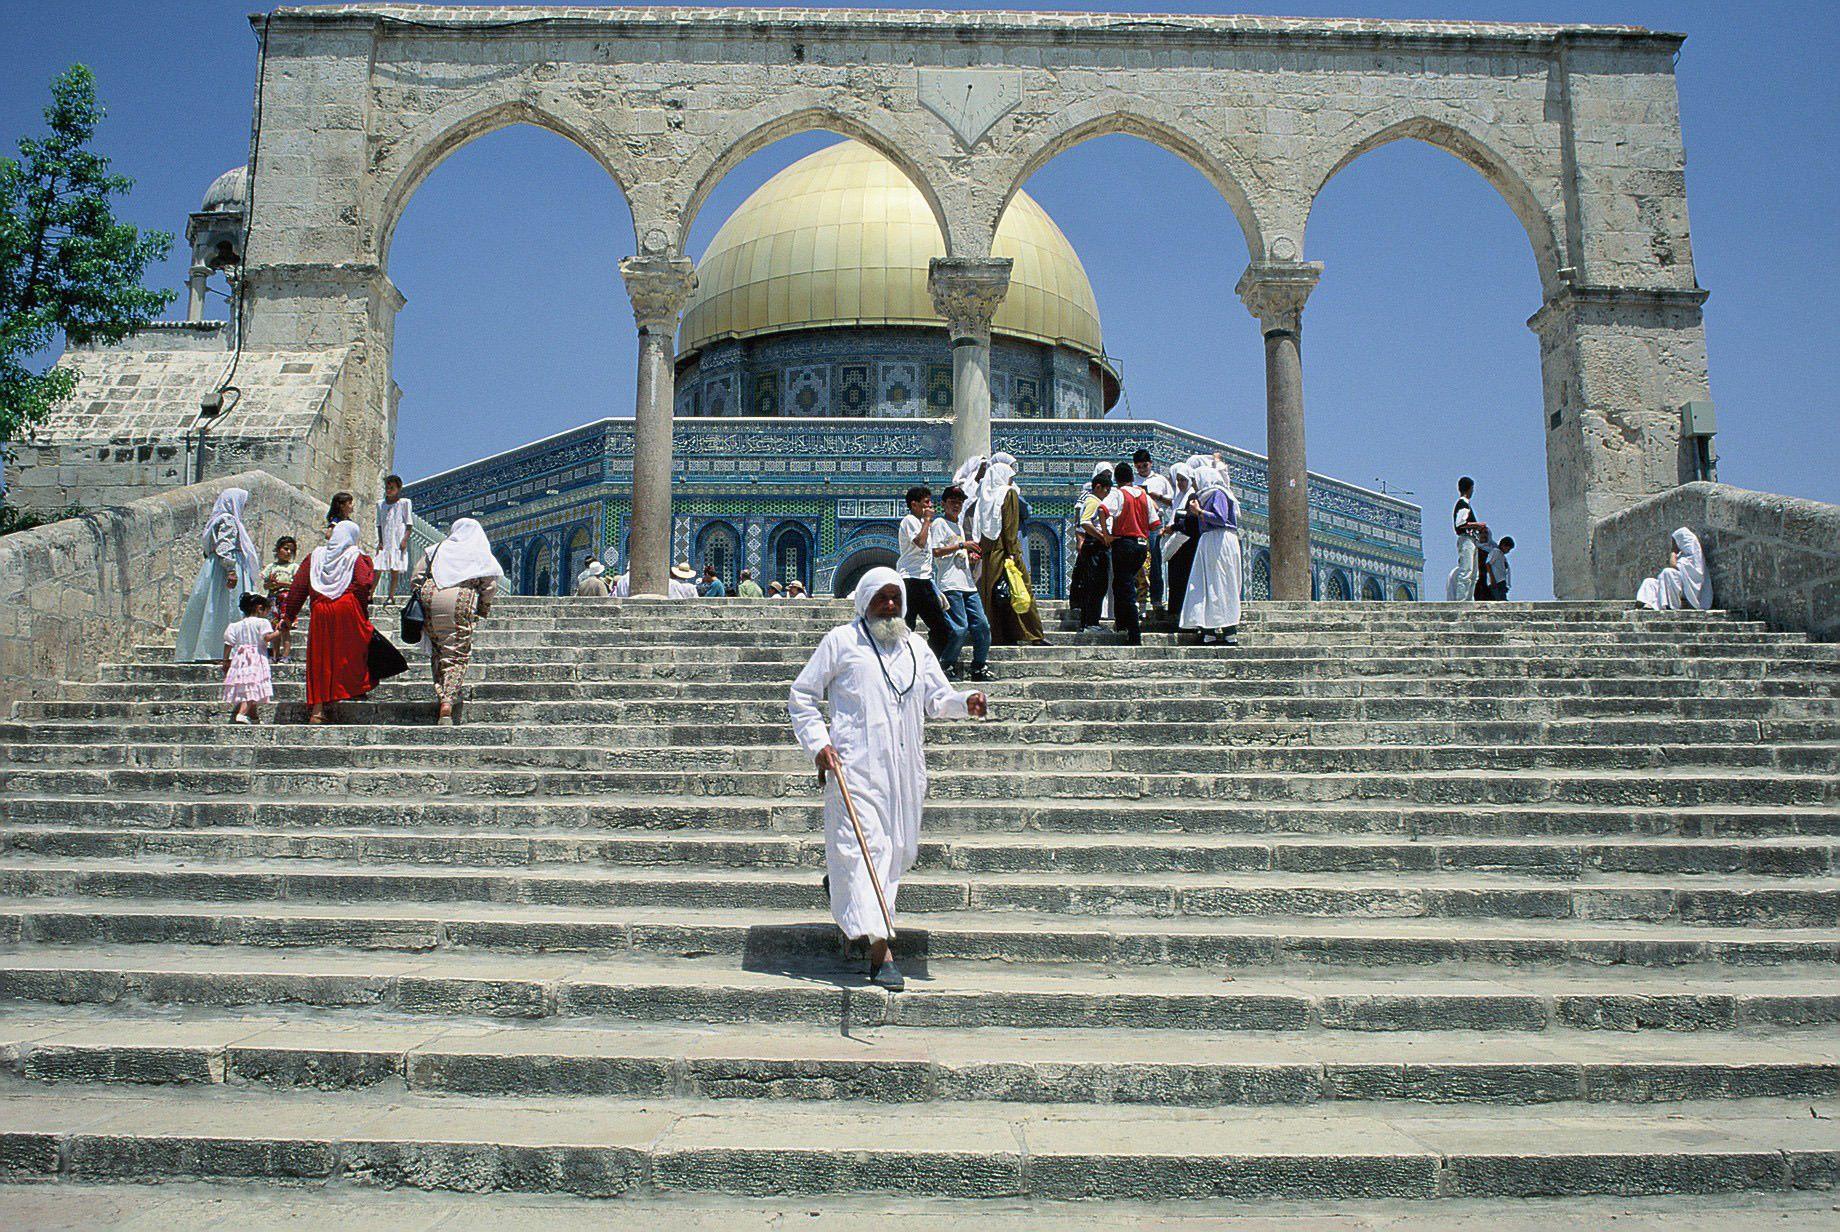 14. La vieja ciudad de Jerusalén. Autor, Mirari Erdoiza